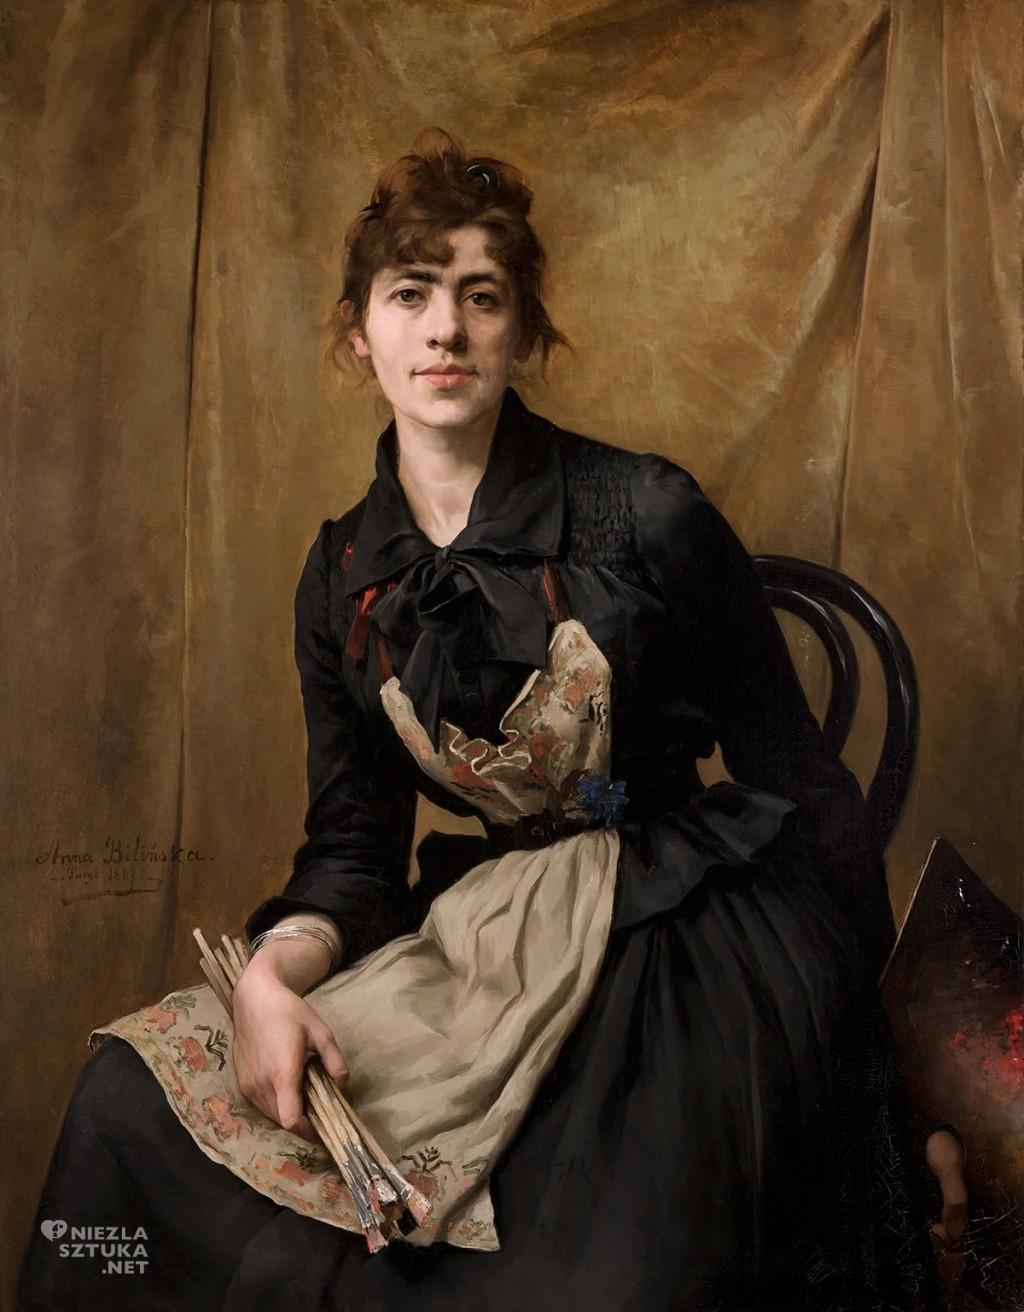 polish art, Anna Bilinska Bohdanowicz, polish painter, Self-Portrait with Apron and Brushes, polish museum, Artophilia.com